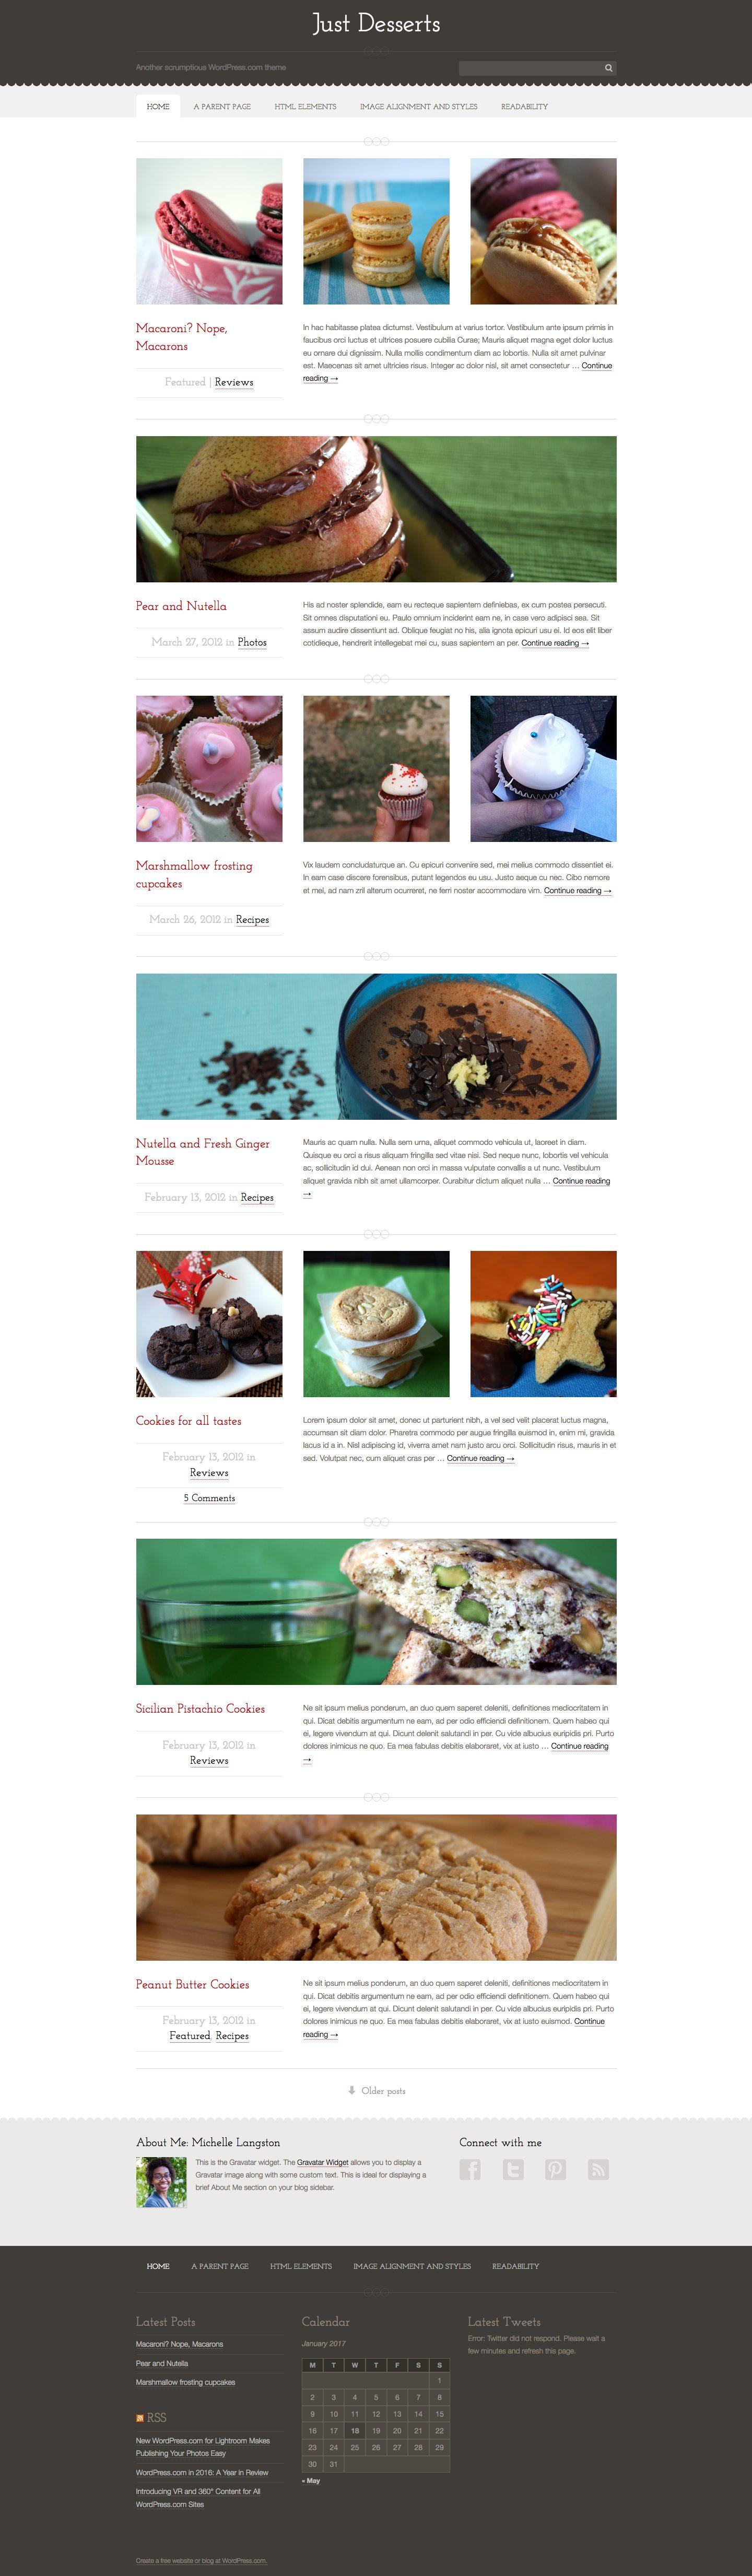 Screenshot of the Just Desserts theme